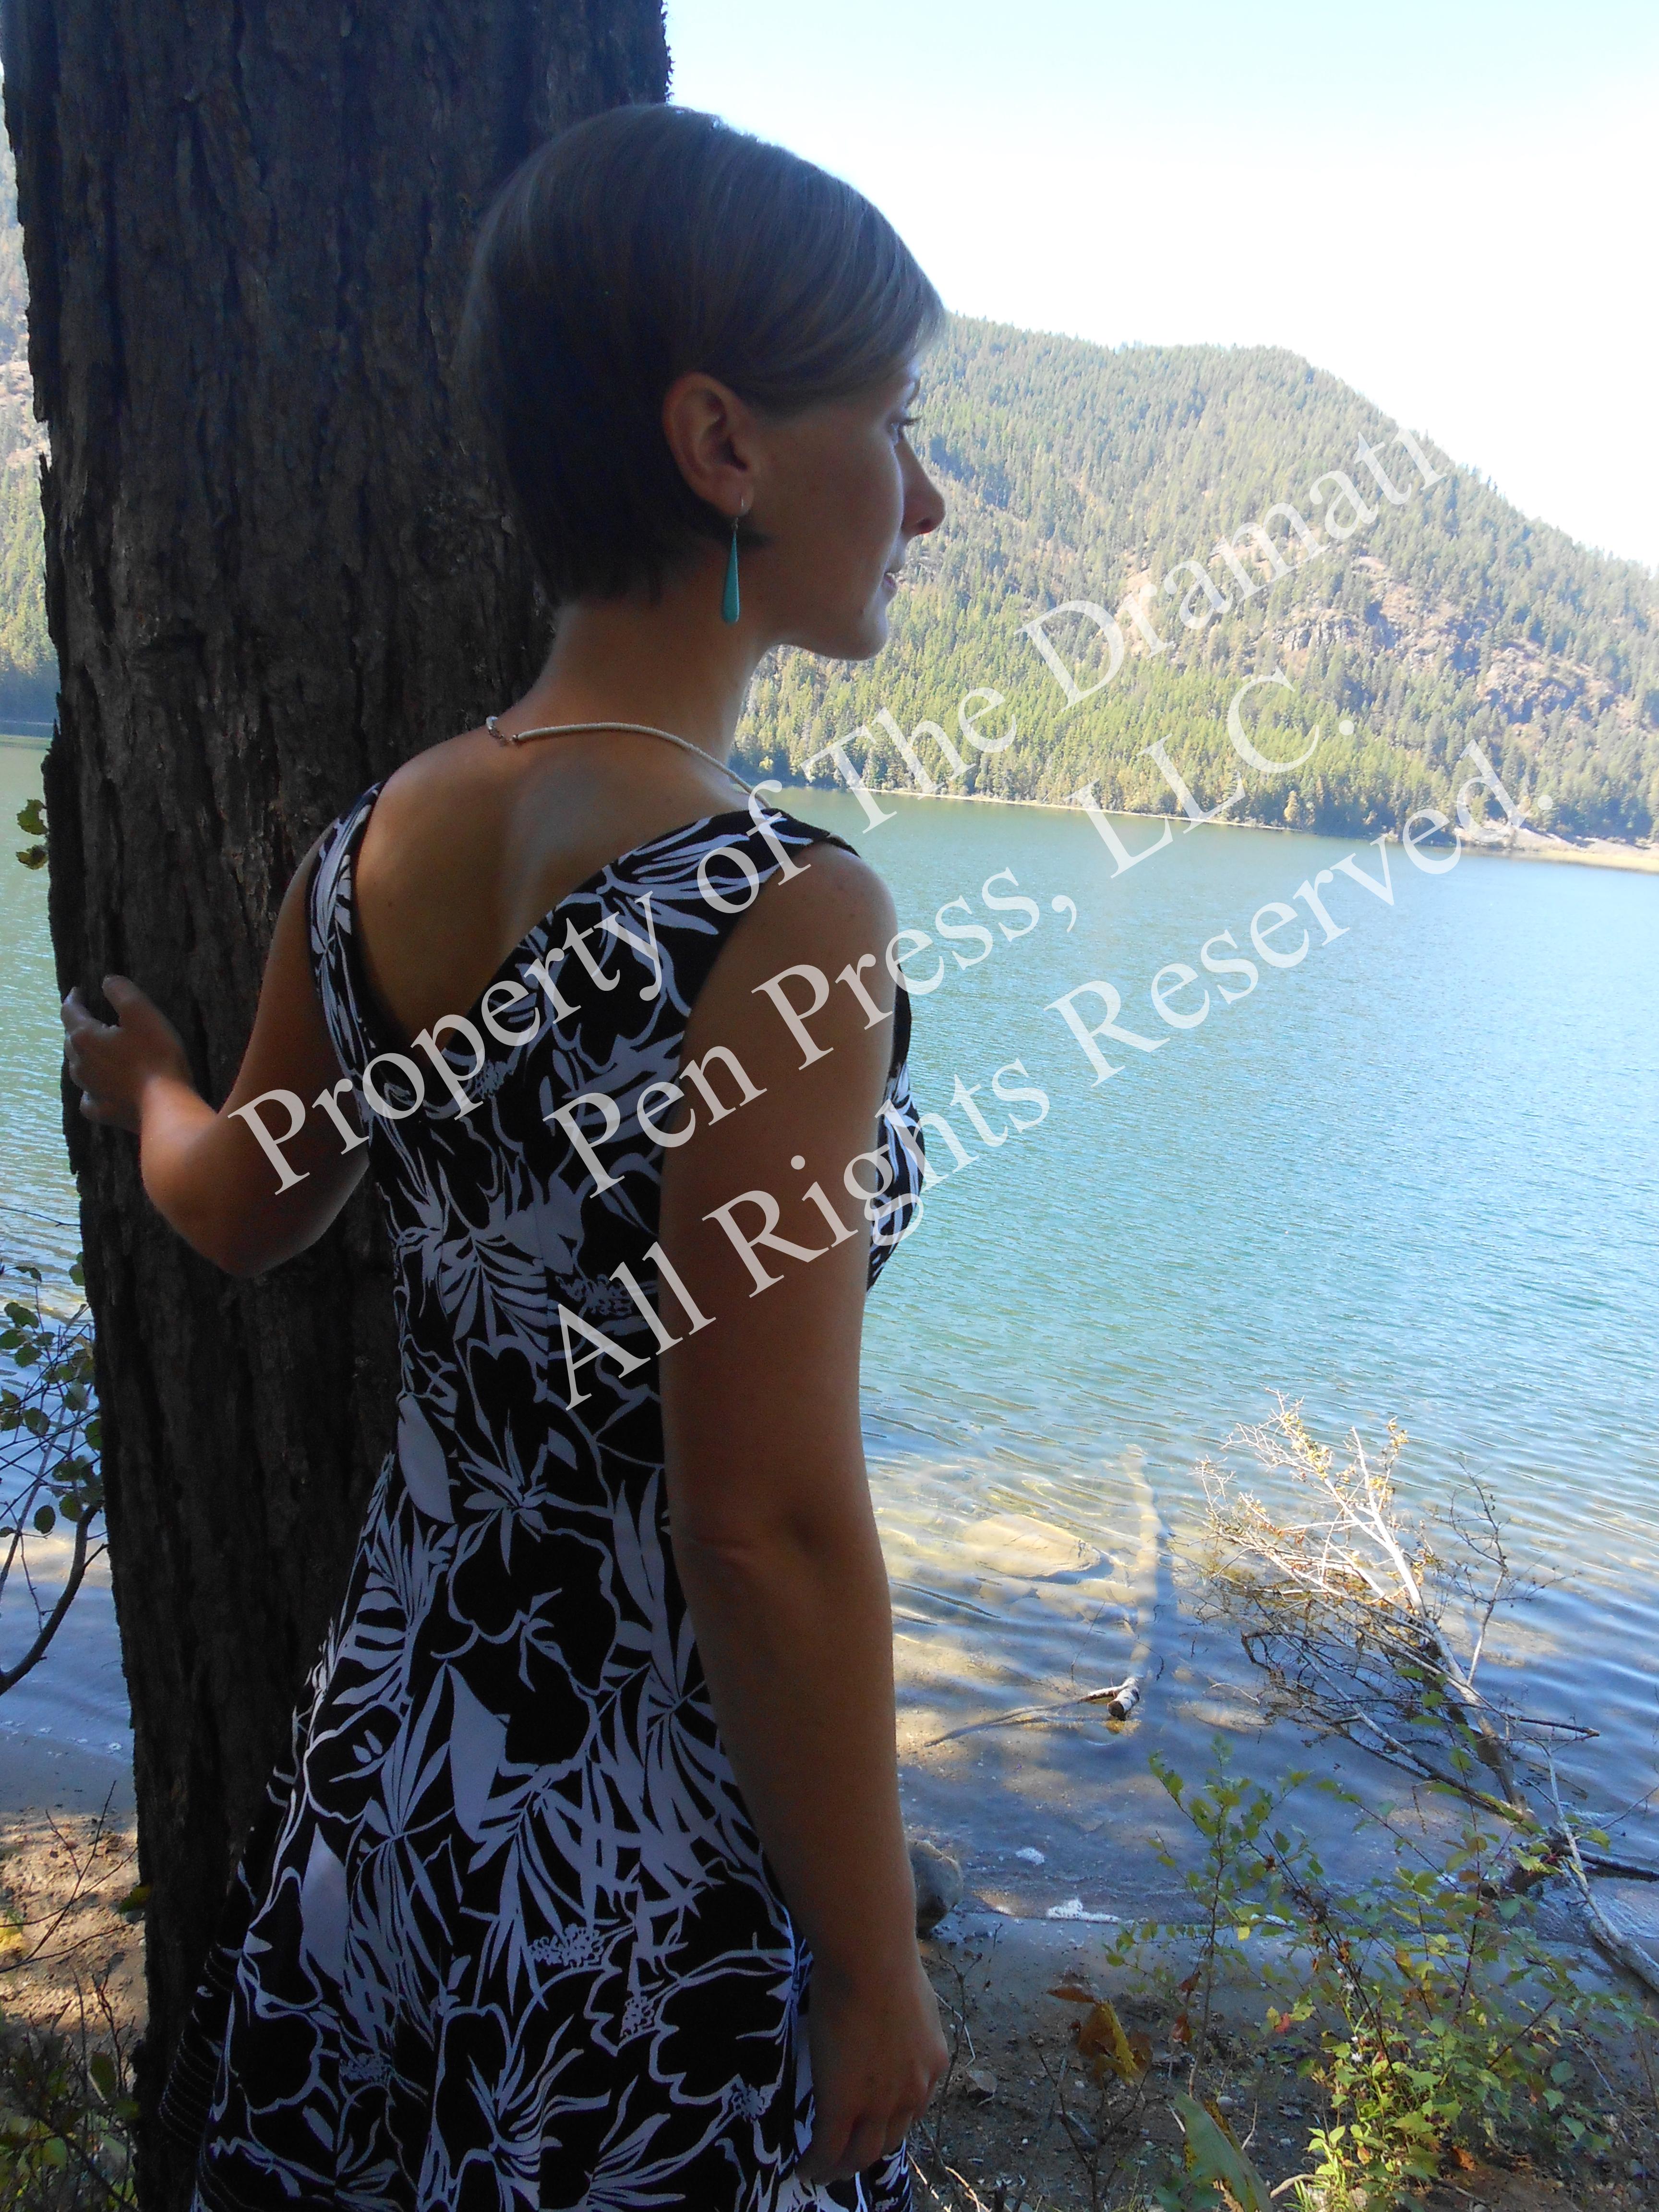 Woman on Shoreline Looking Away